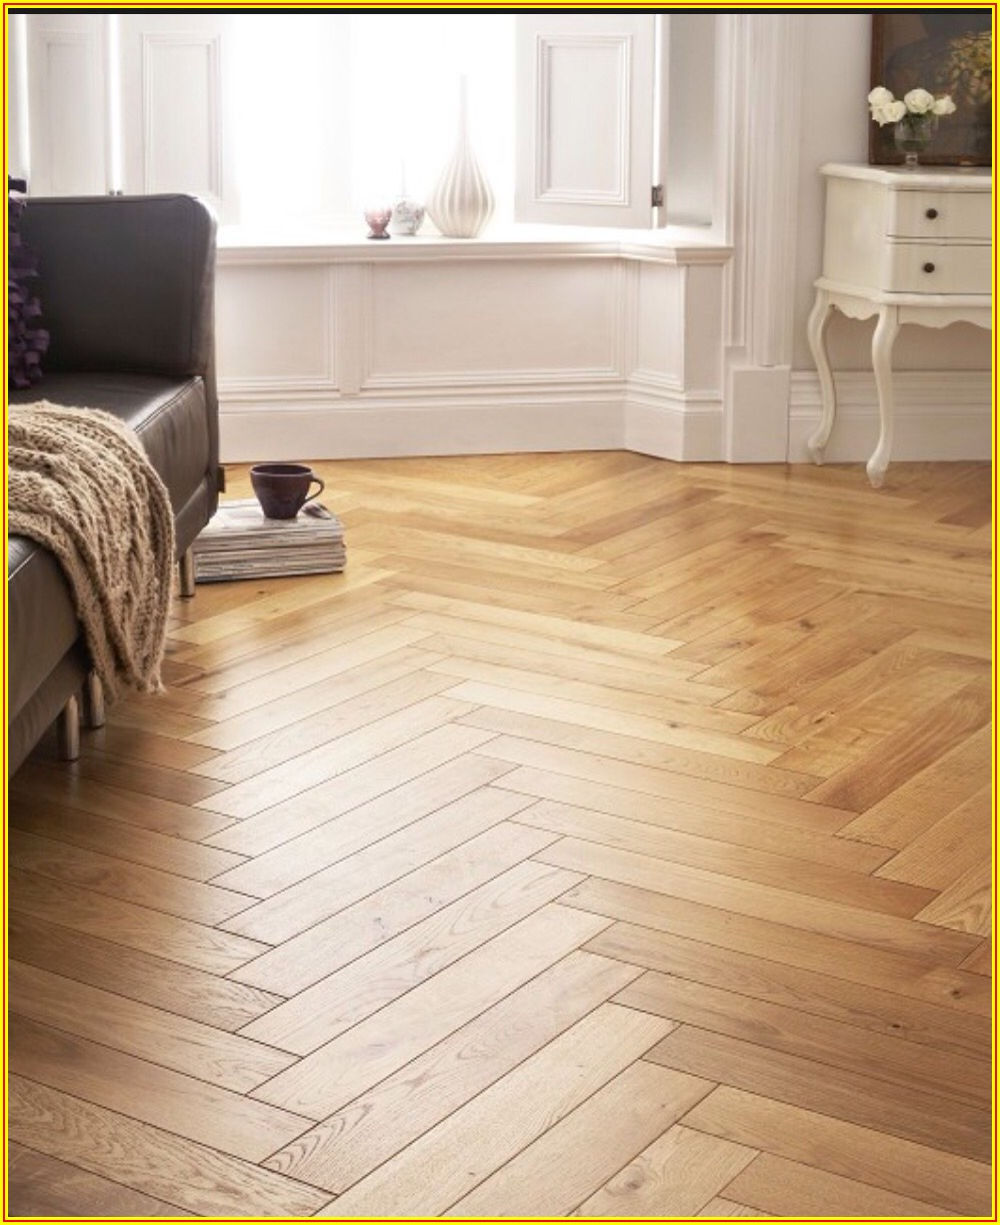 Herringbone Pattern Laminate Flooring